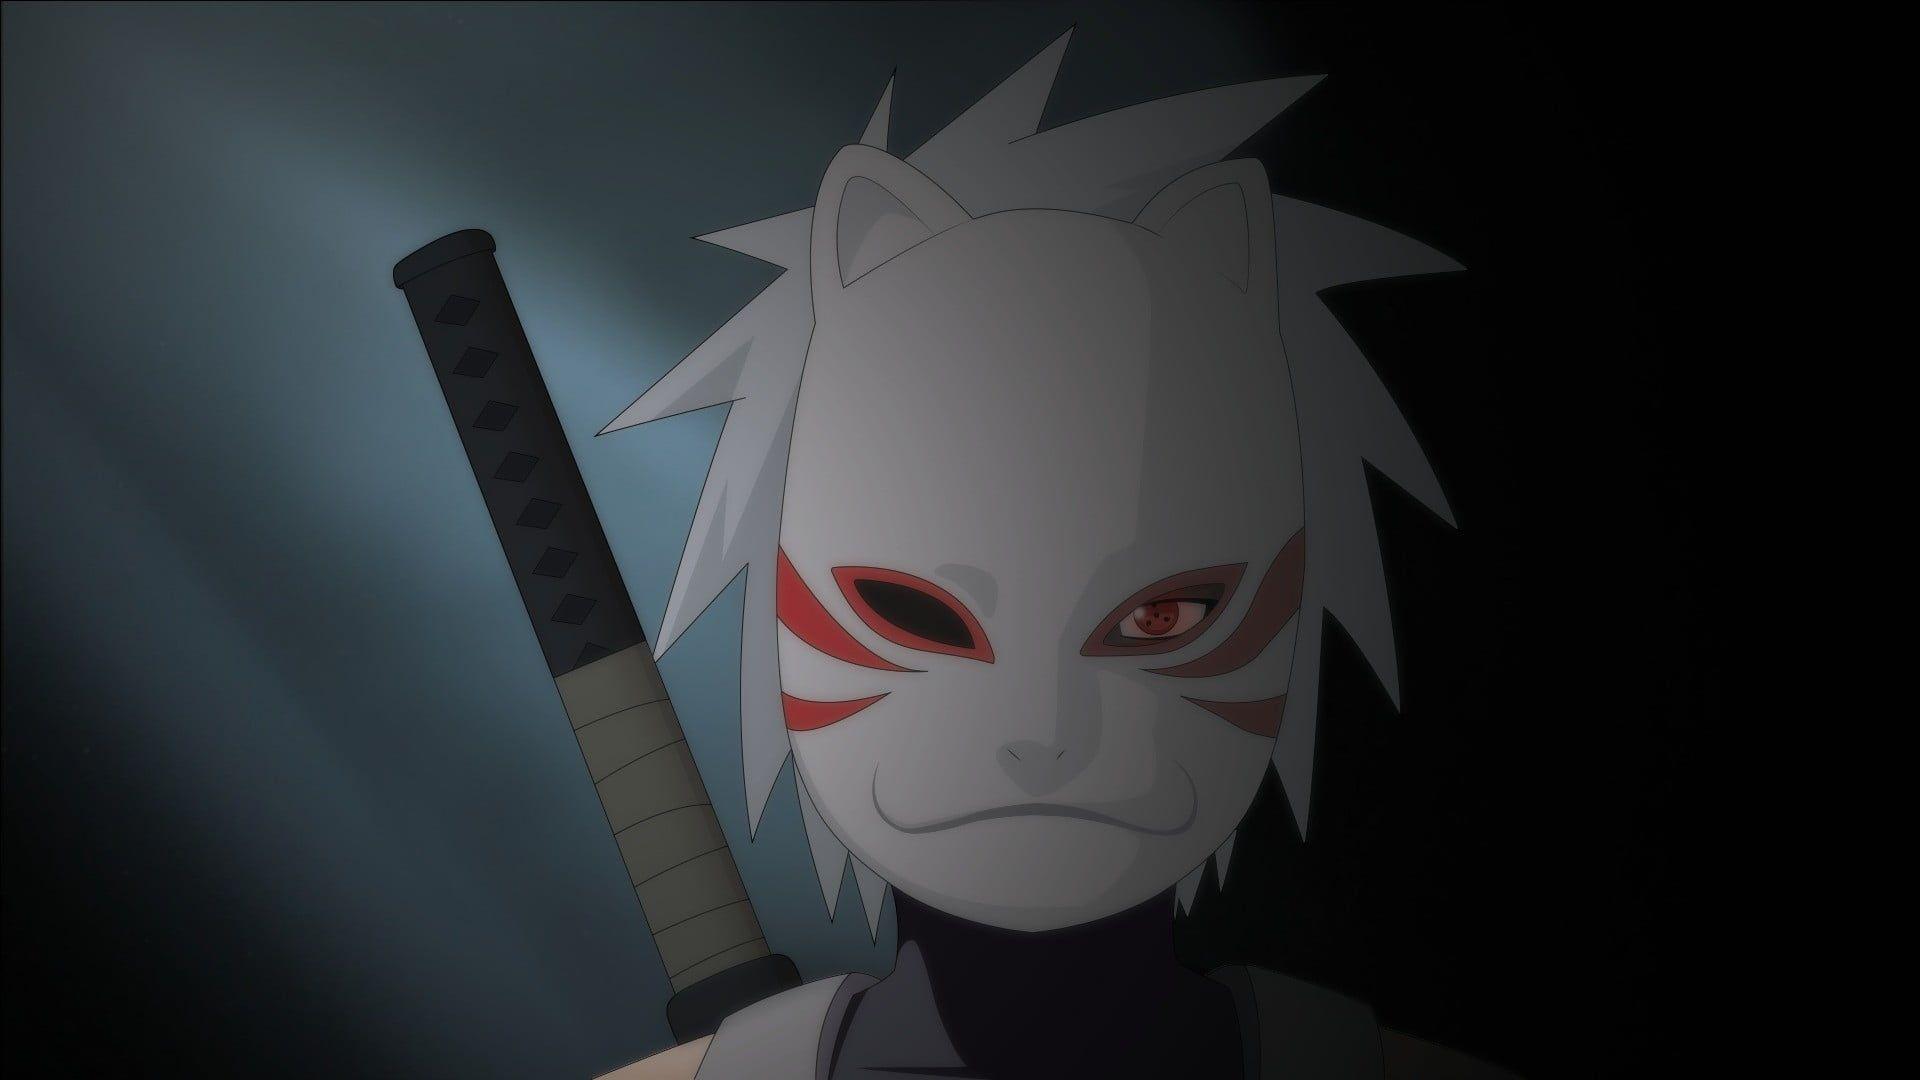 Naruto Character Illustration Naruto Shippuuden Hatake Kakashi Anbu Mask Anime 1080p Wallpaper Hdwall Kakashi Anbu Kakashi Hatake Naruto Wallpaper Iphone